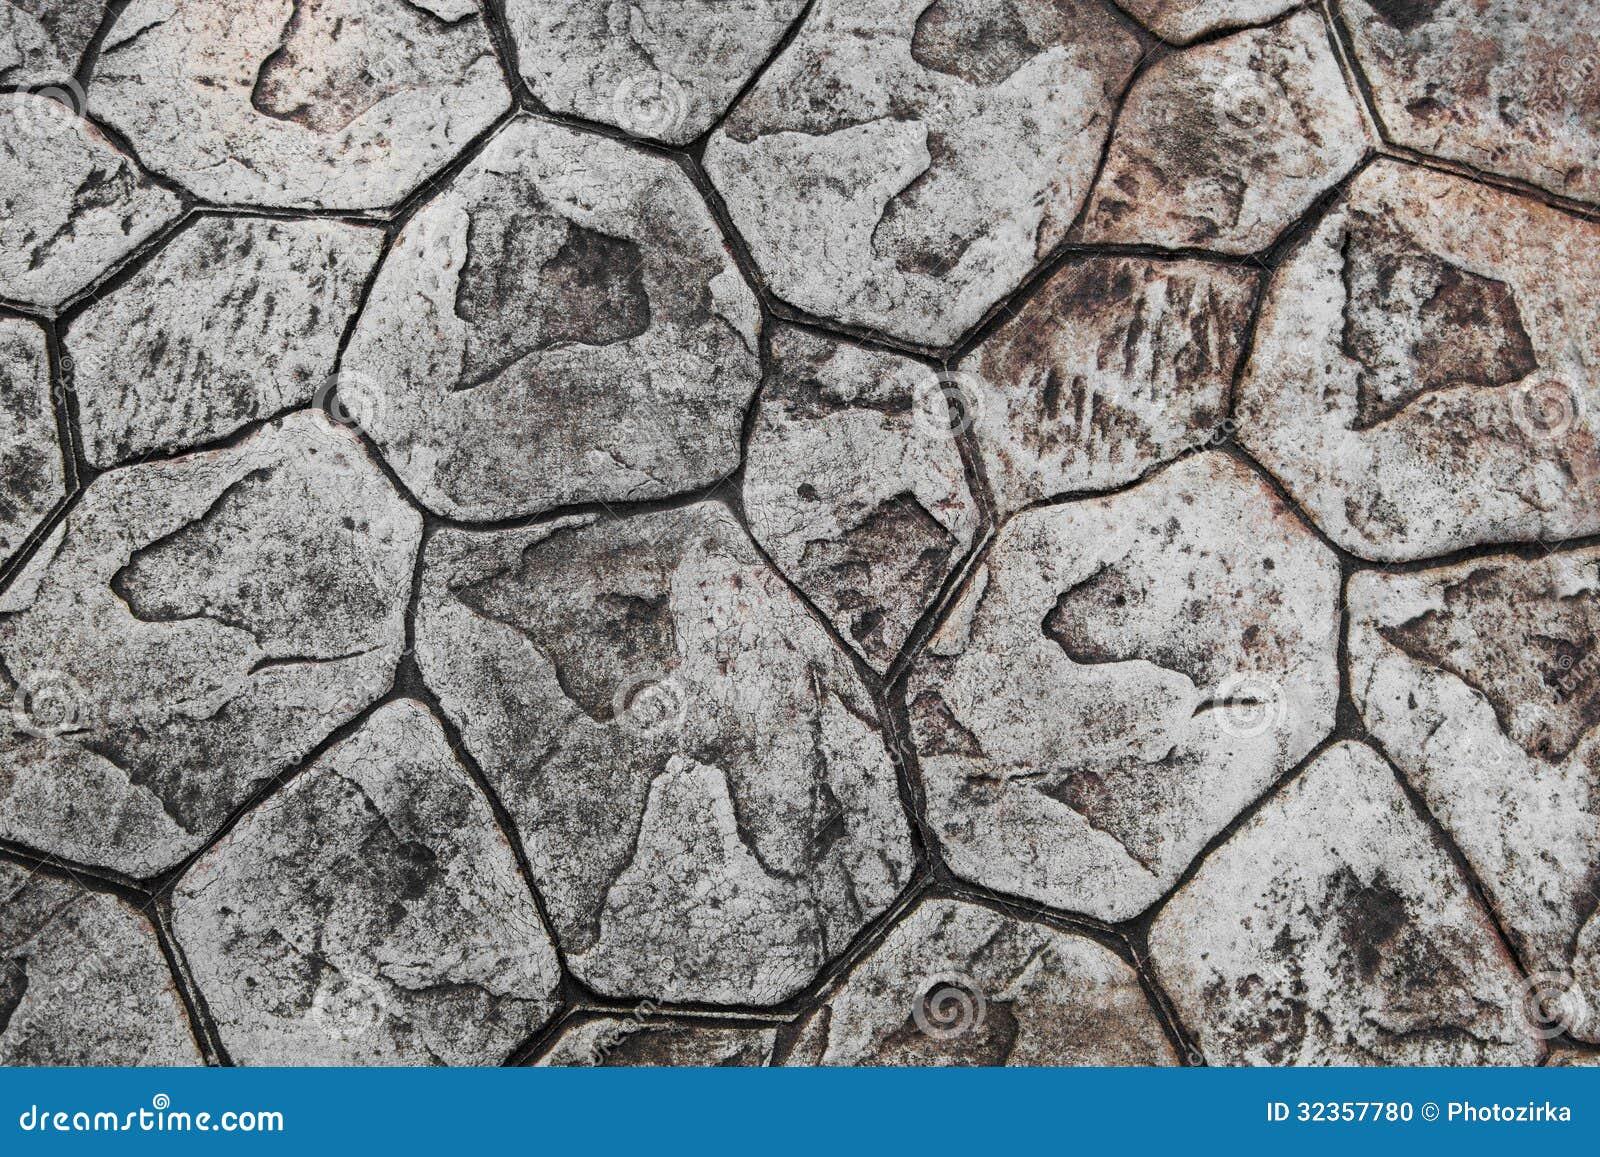 Texture Of Stone Paving Stock Photo Image 32357780